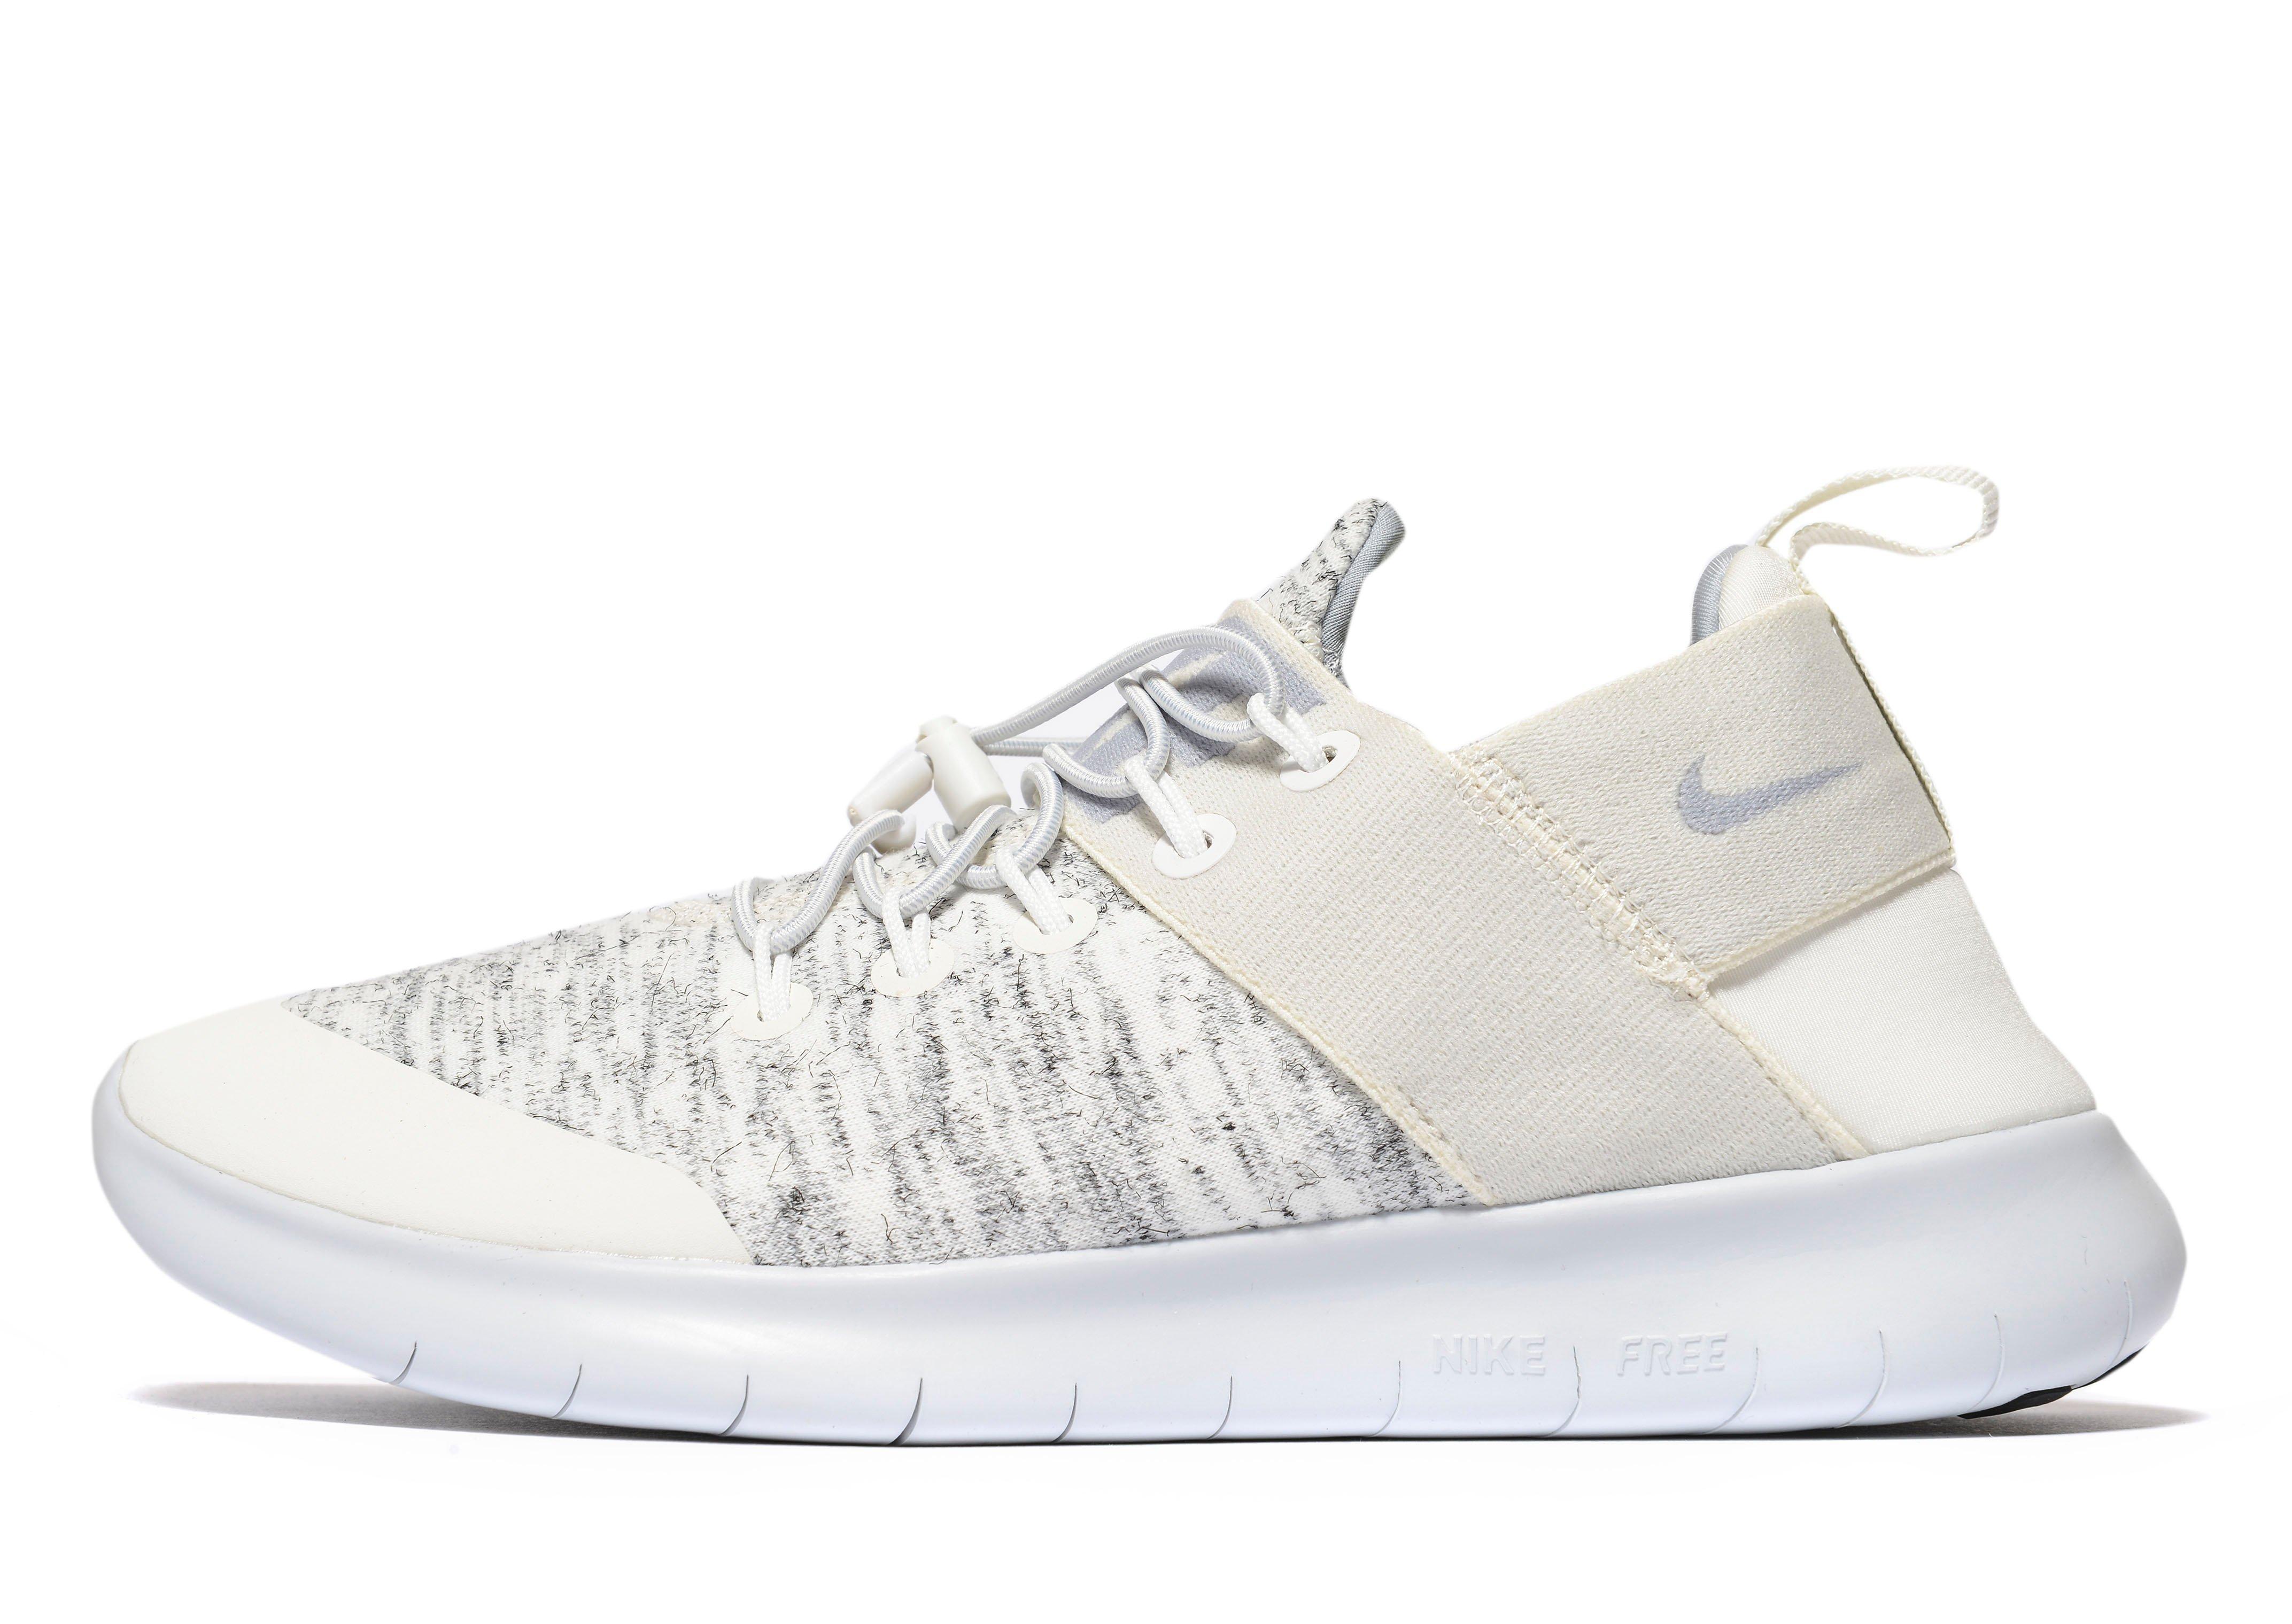 adb63d13fcd Lyst - Nike Free Run Commuter 2 in Gray for Men